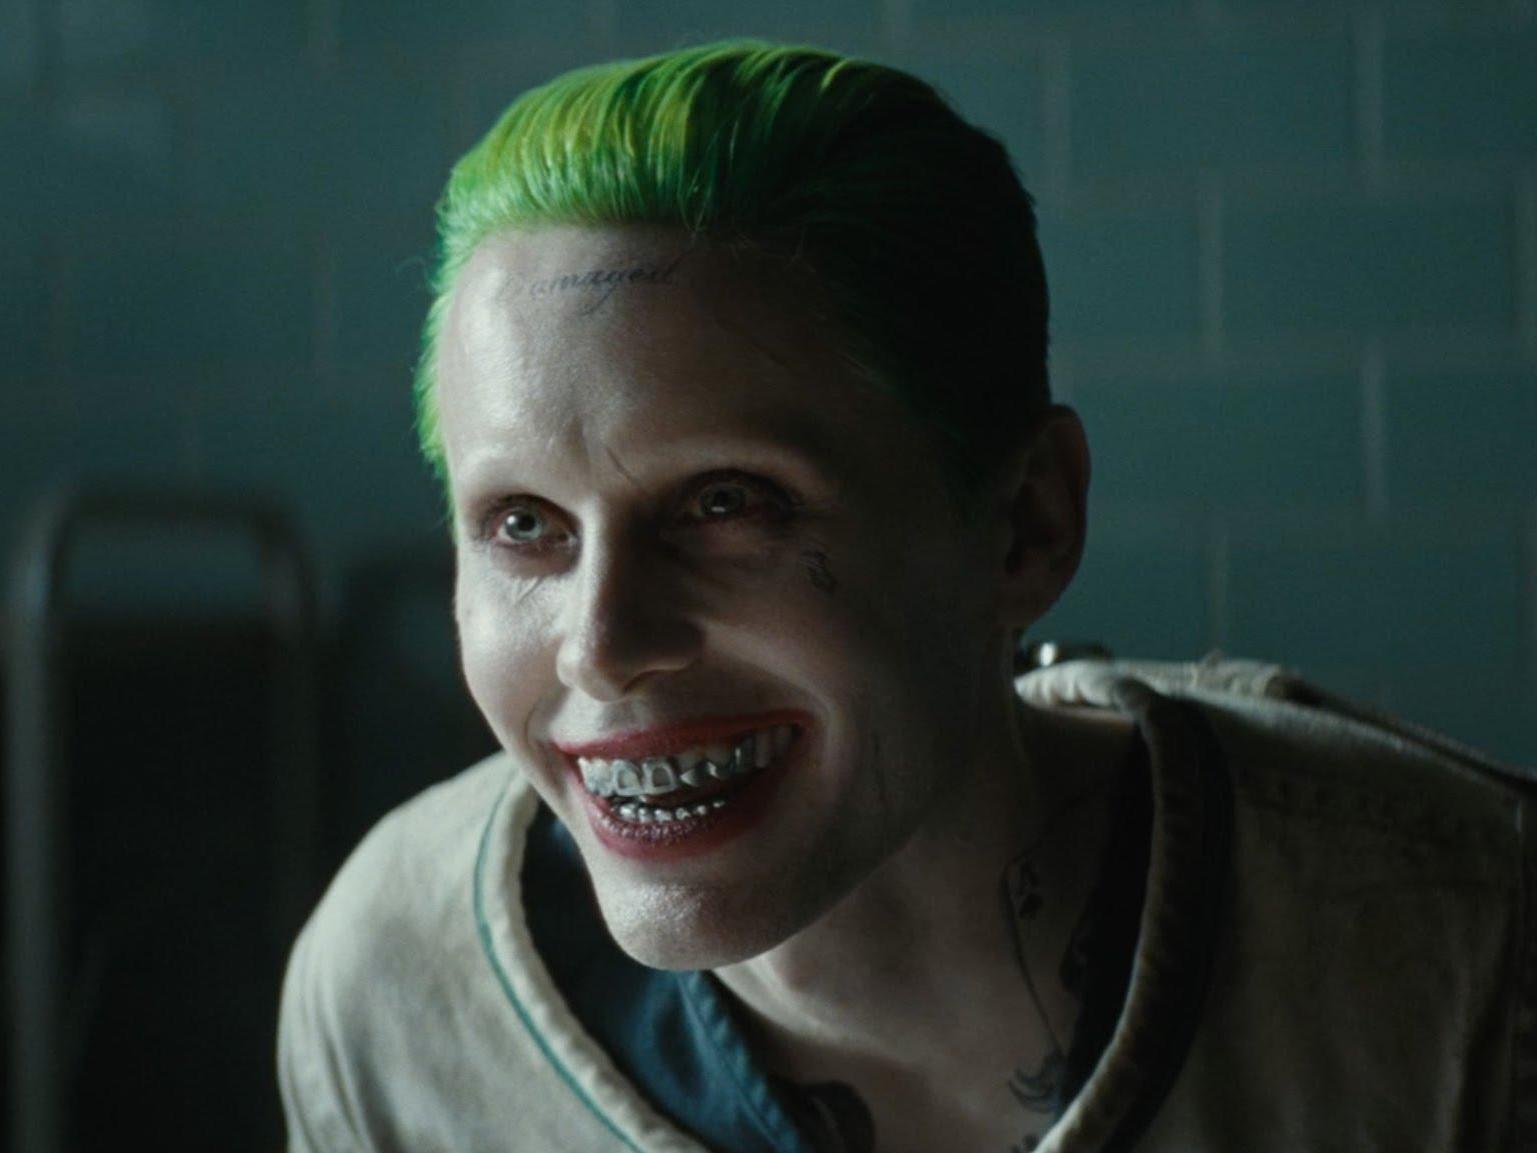 Joker Jared Leto \u0027alienated and upset\u0027 by new Joaquin